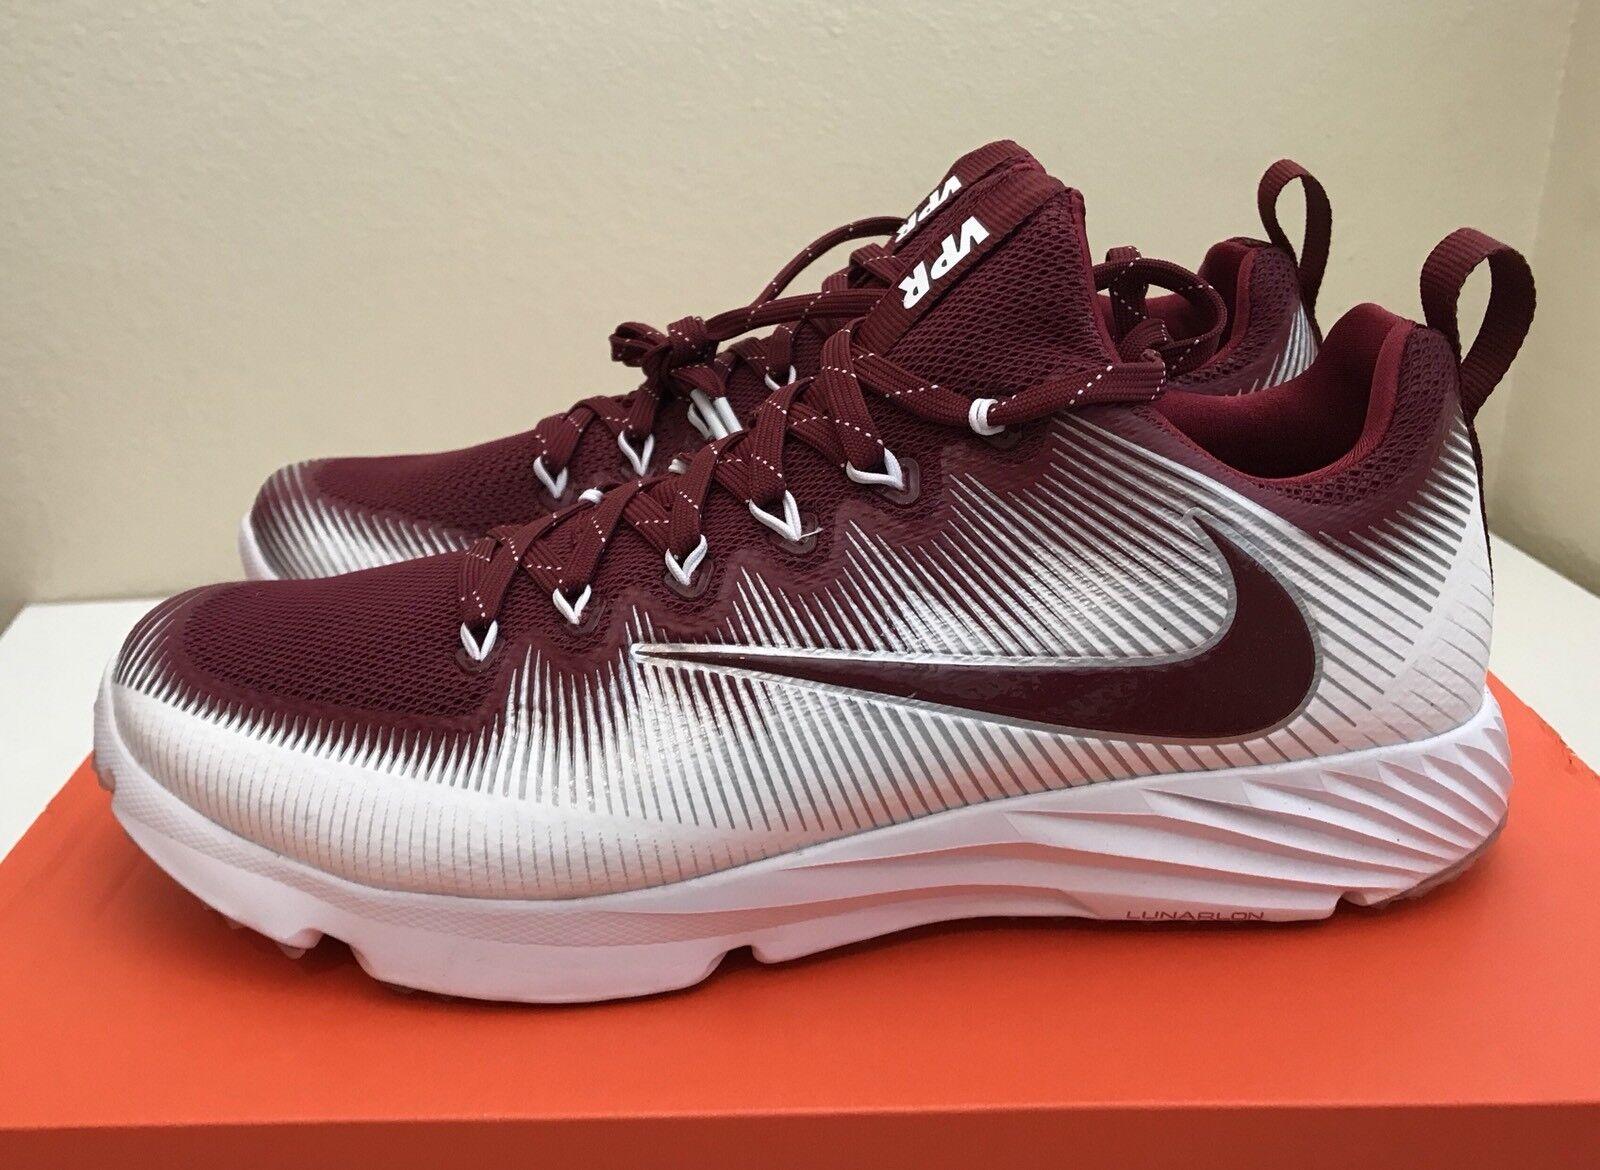 Nike Vapor Speed Turf Team Red White Maroon Football LAX NEW Training Mens Sz 9 NEW LAX 3d4c88